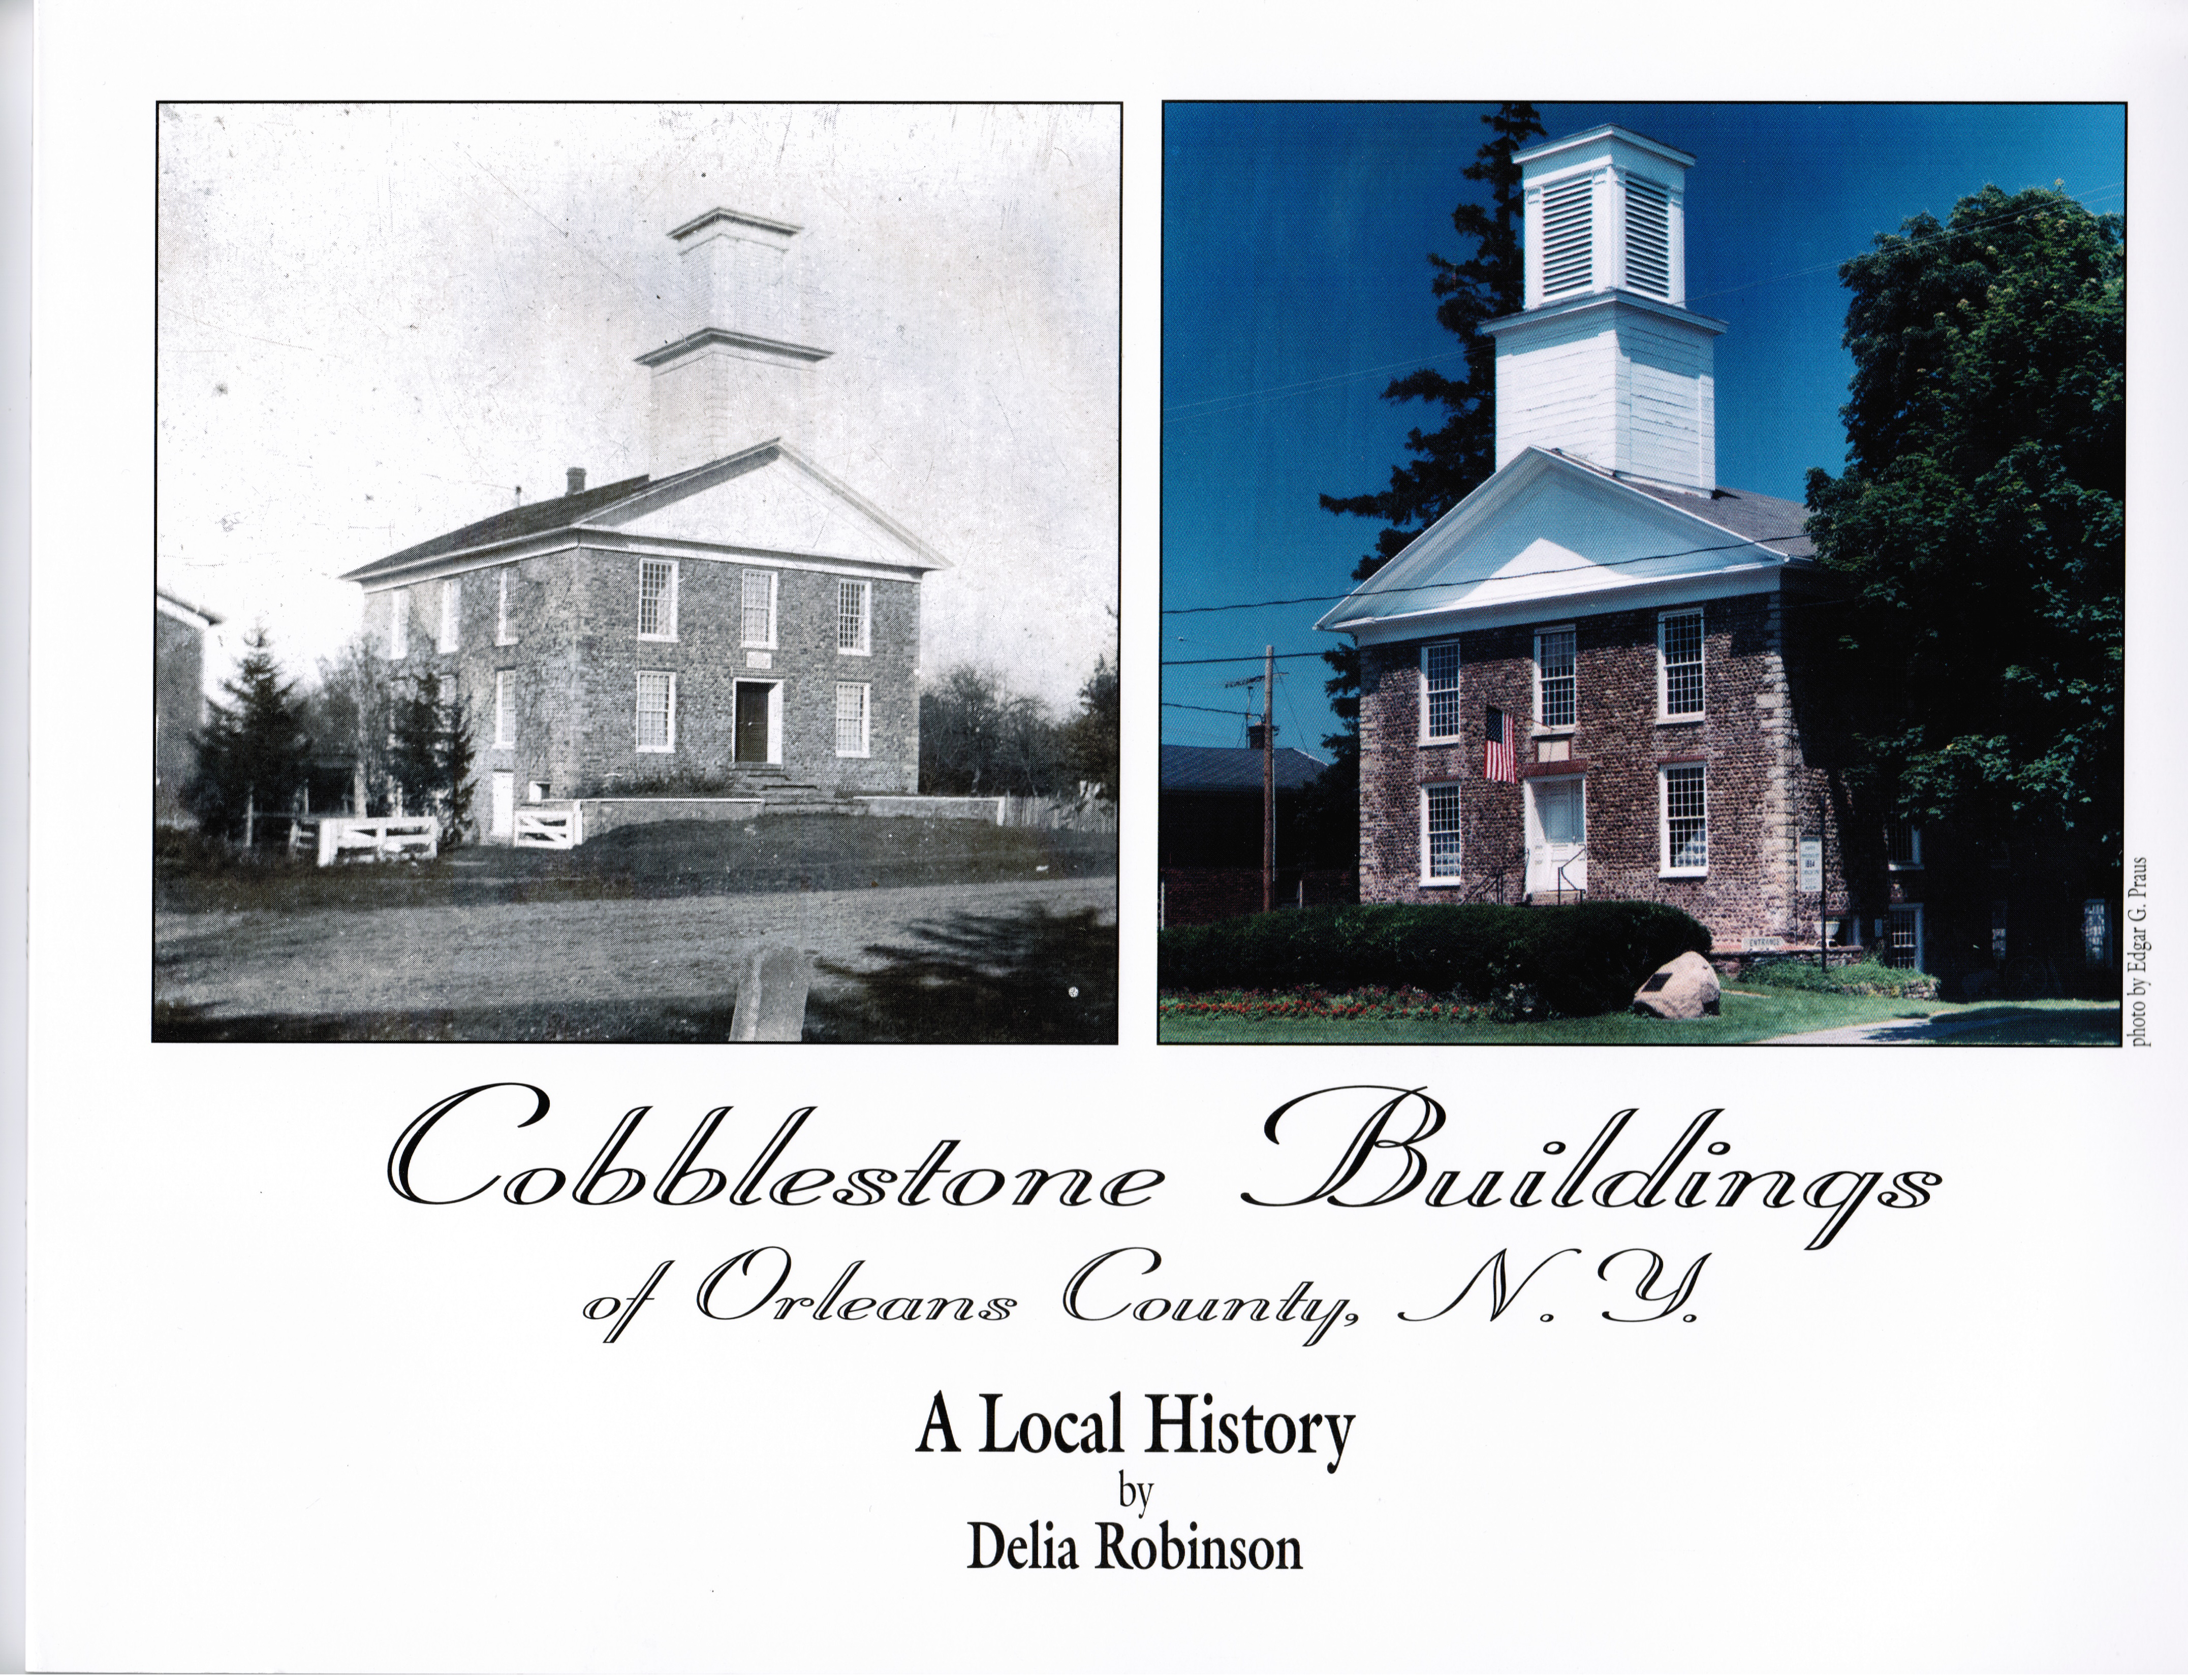 Coloring book real estate - Cobblestone Buildings Of Orleans County N Y